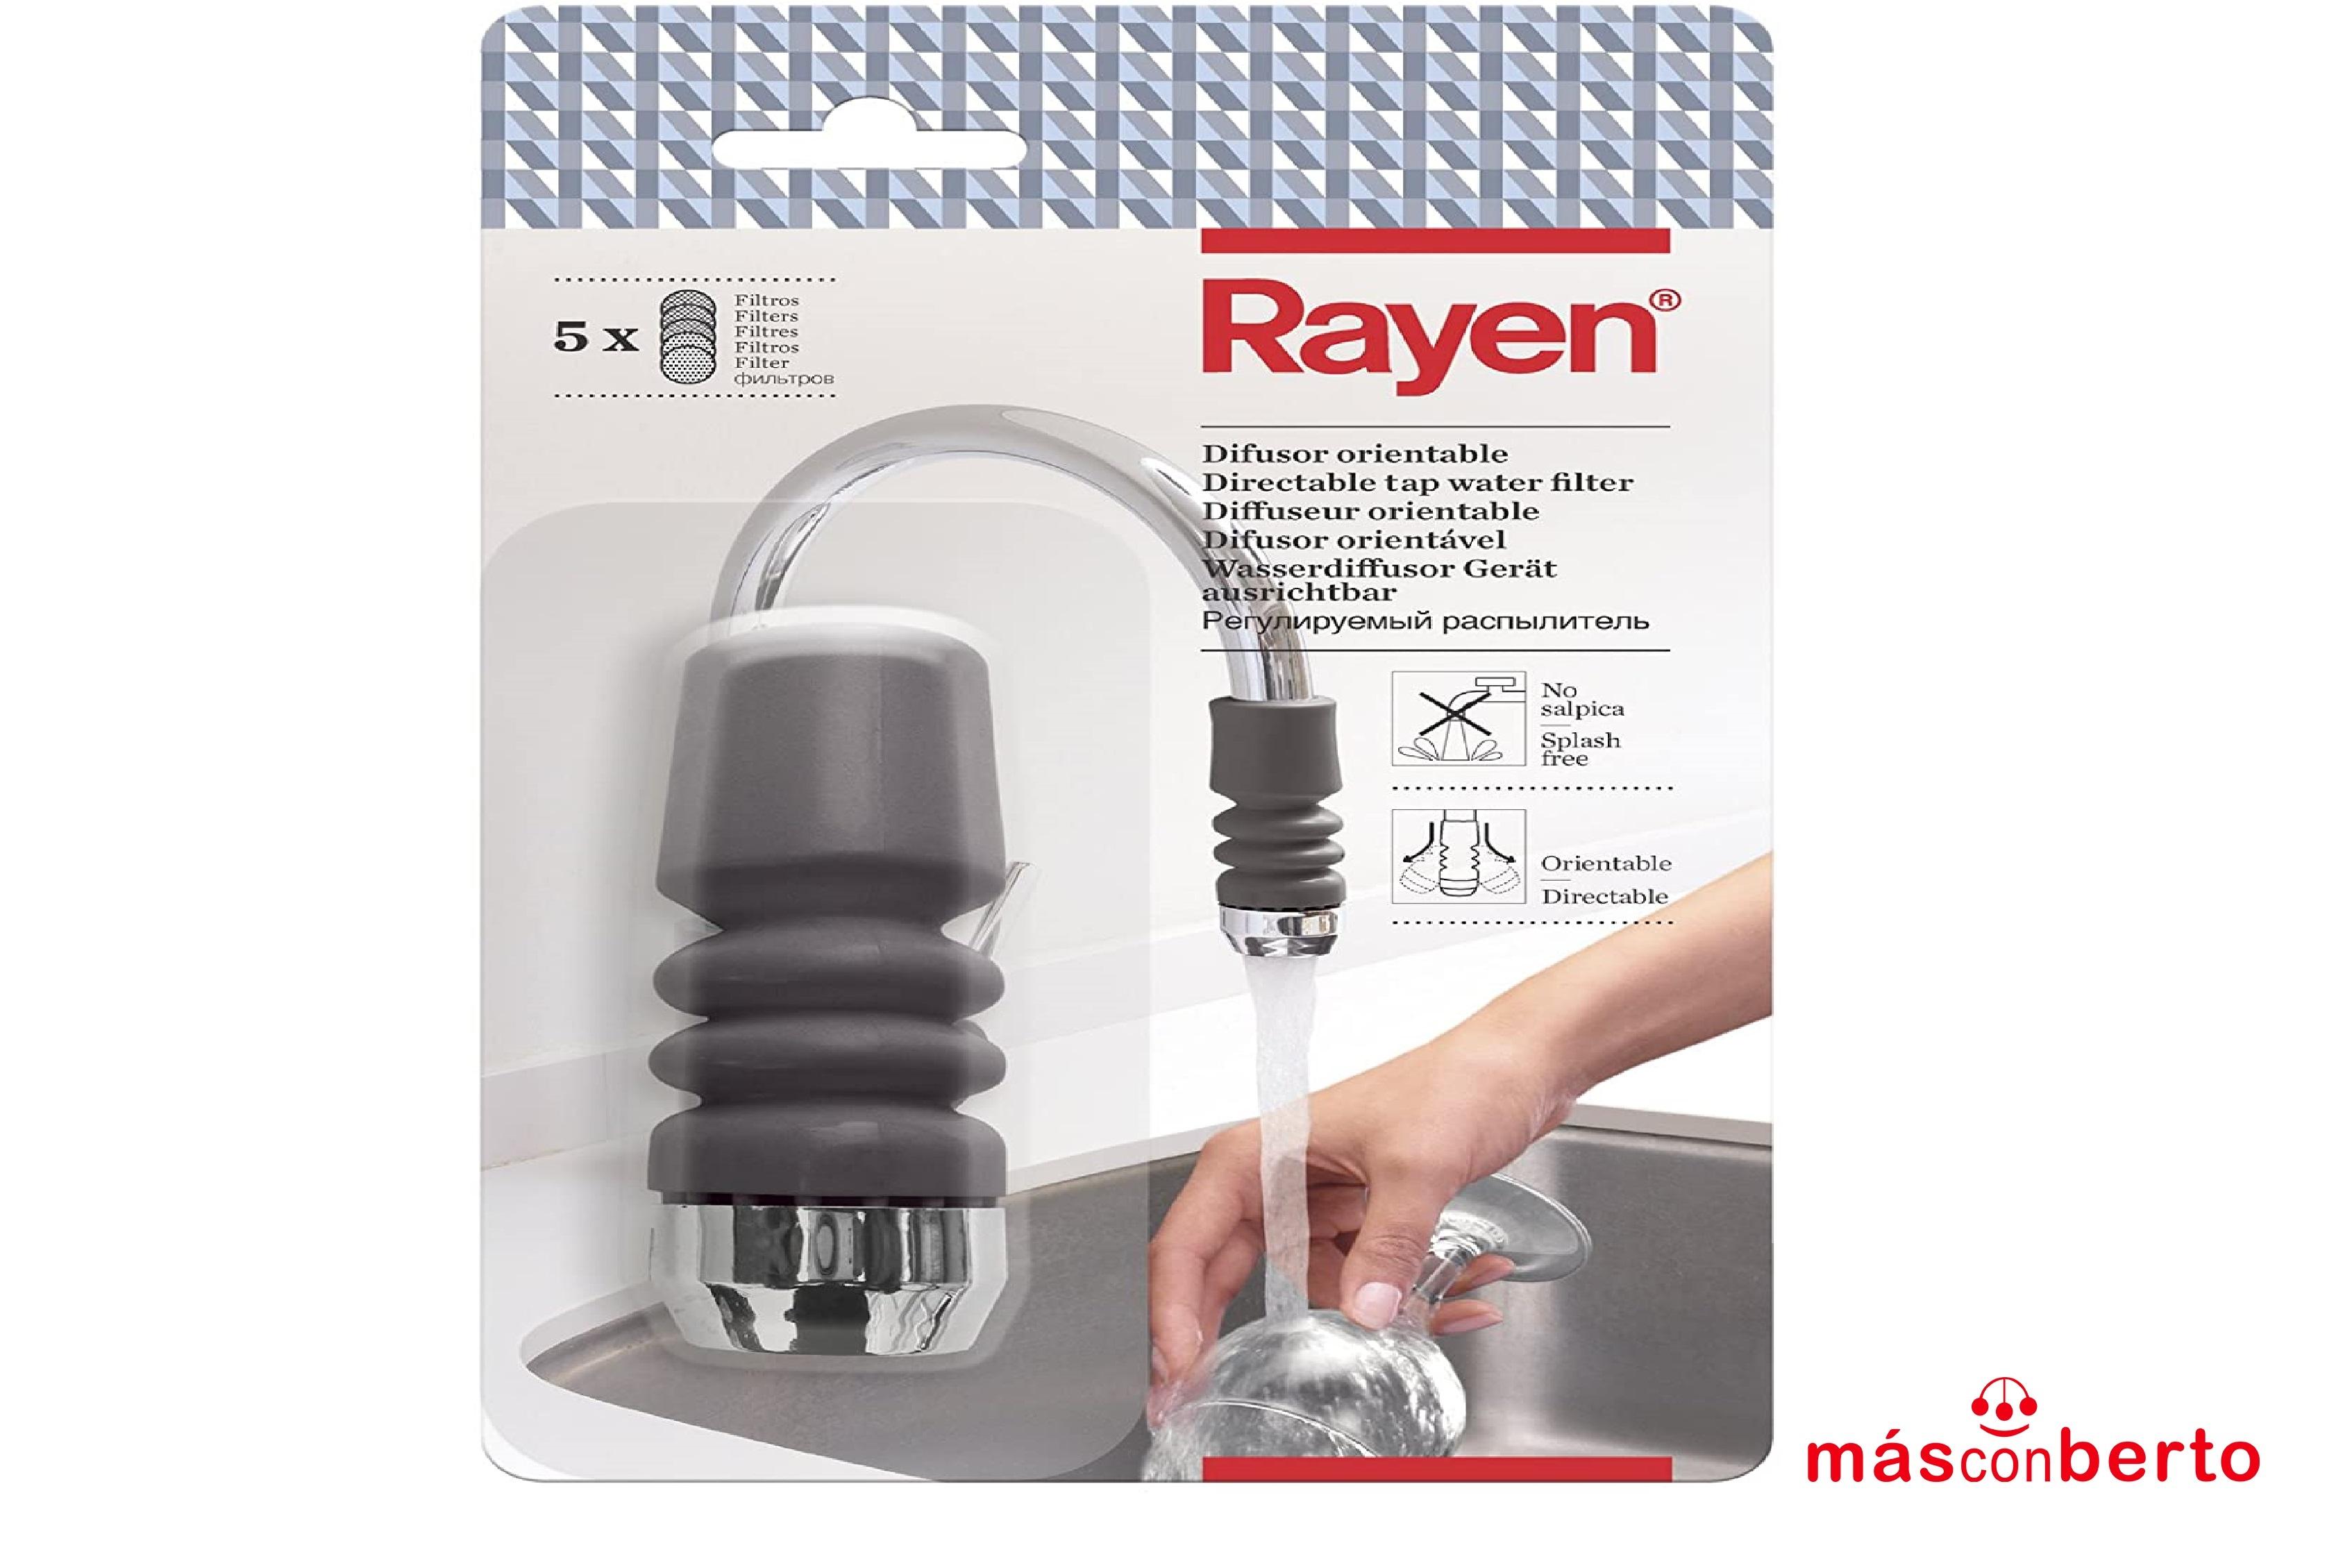 Difusor Orientable Rayen